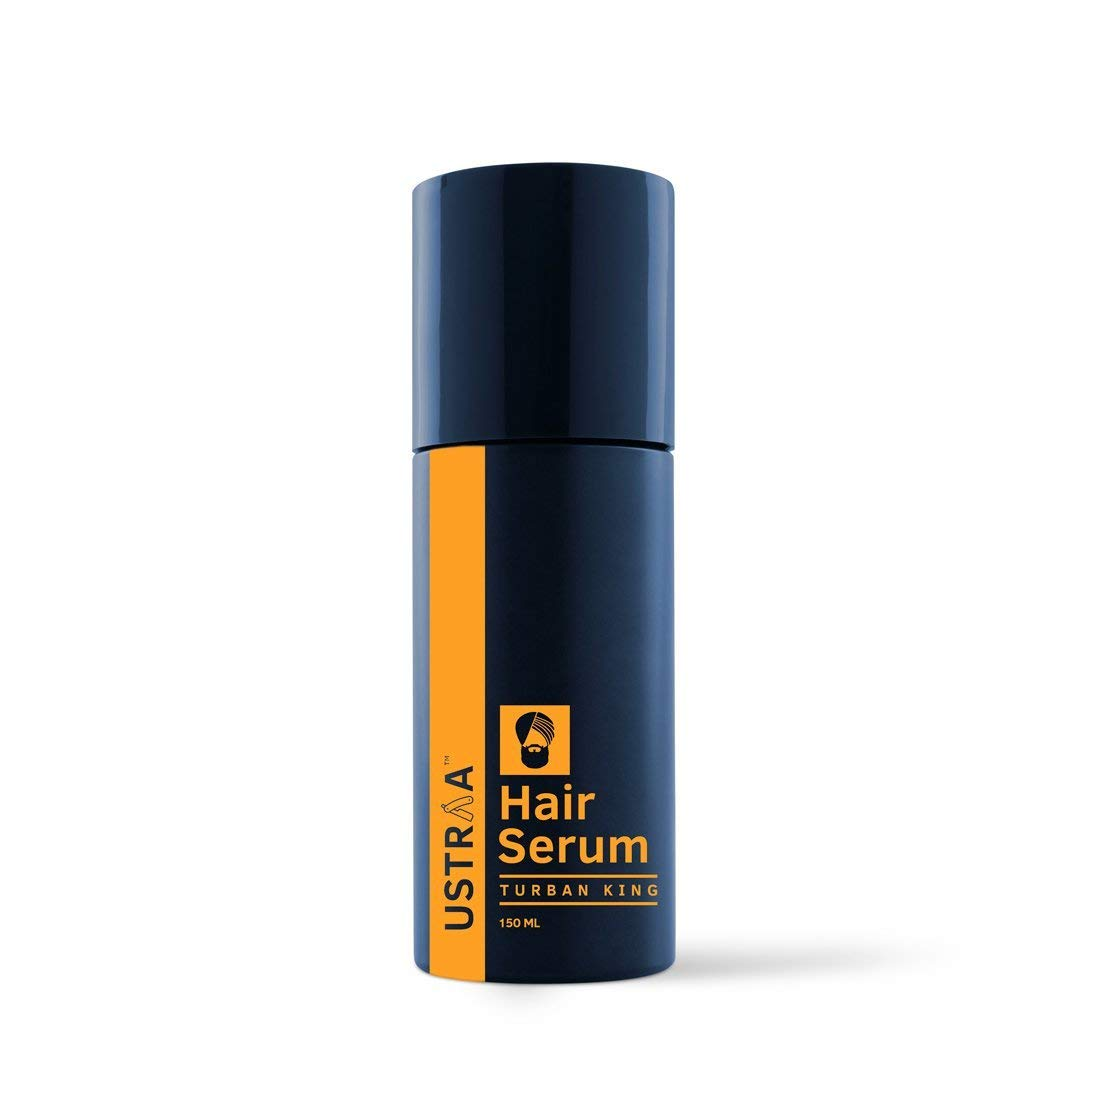 Glamorous Hub - Ustraa Turban Pride Hair Serum, 100ml by Glamorous Hub